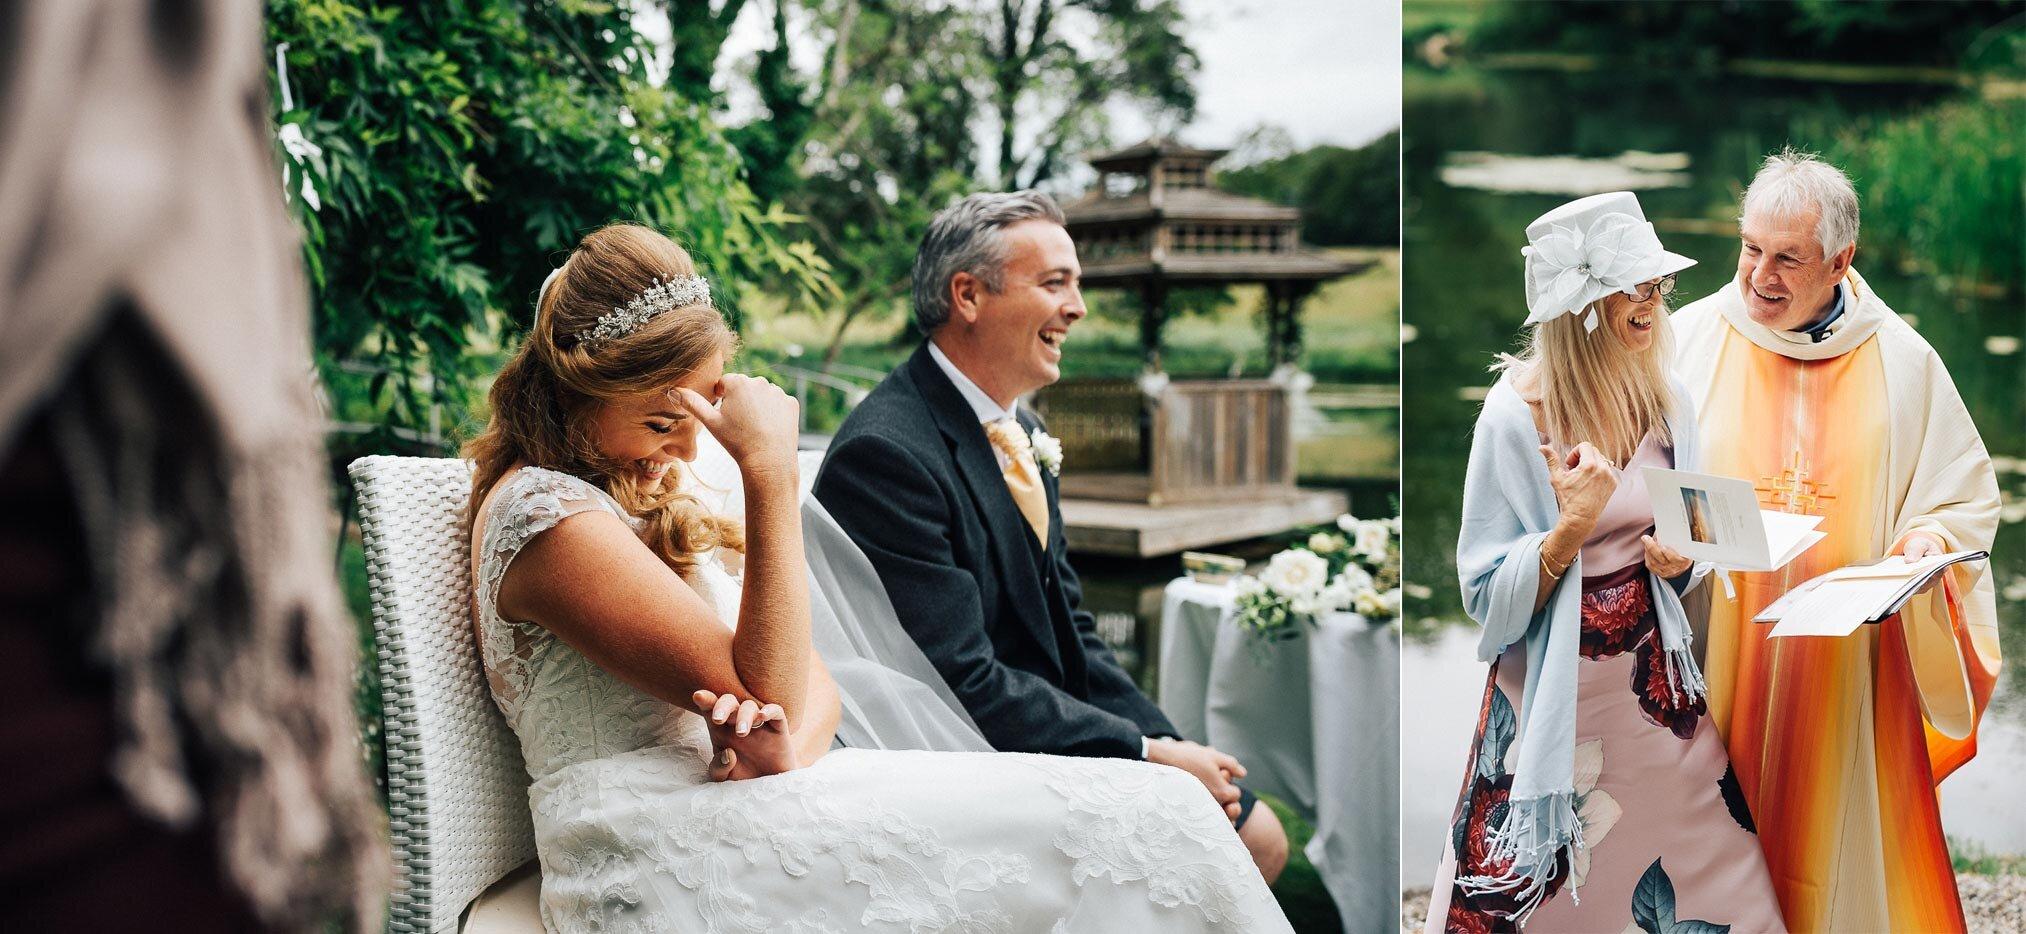 destination-wedding-photographer-australia-5.jpg